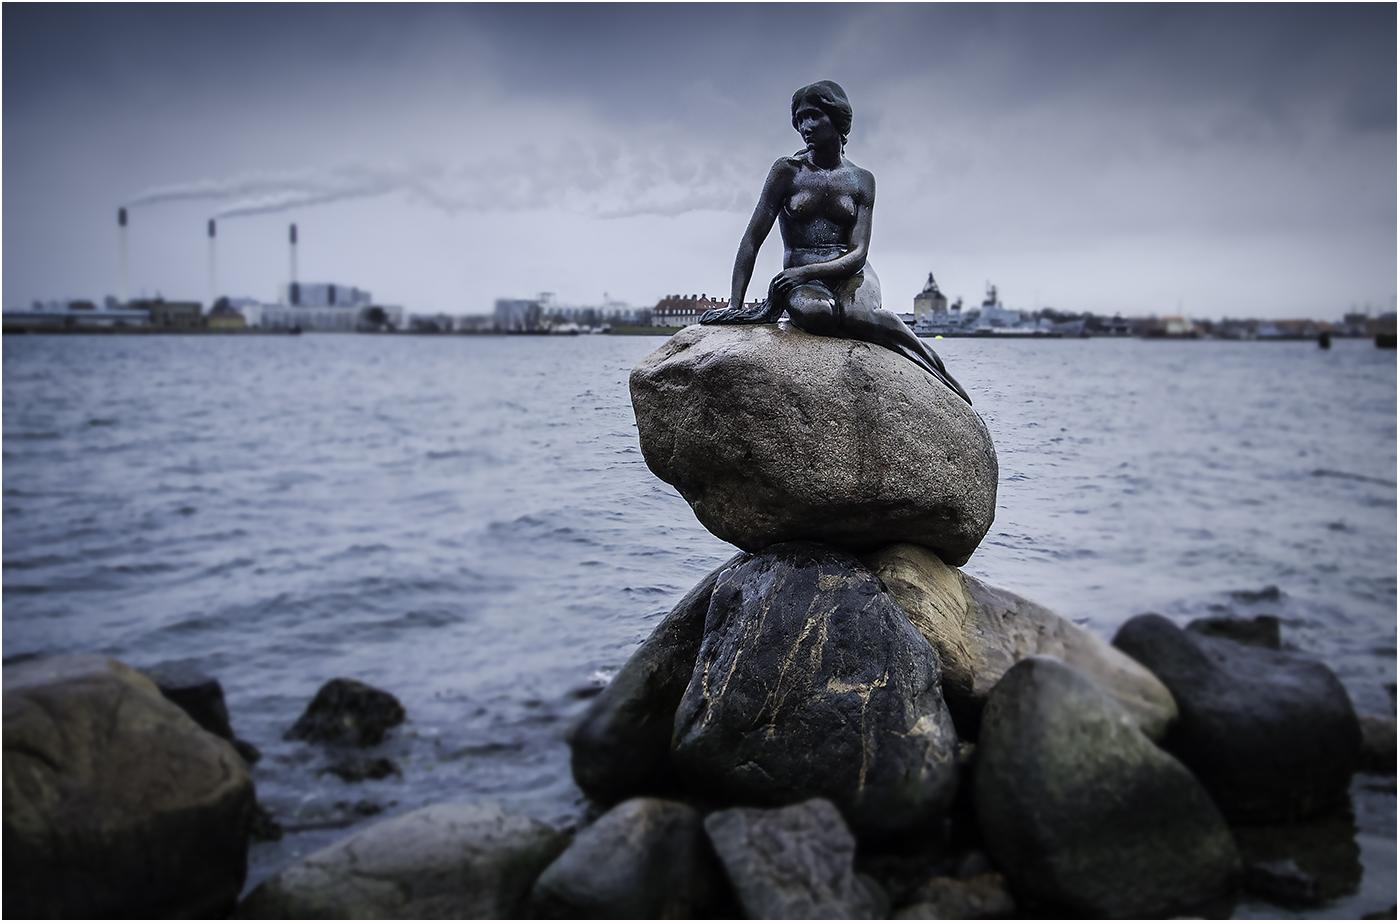 Русалочка - символ Копенгагена